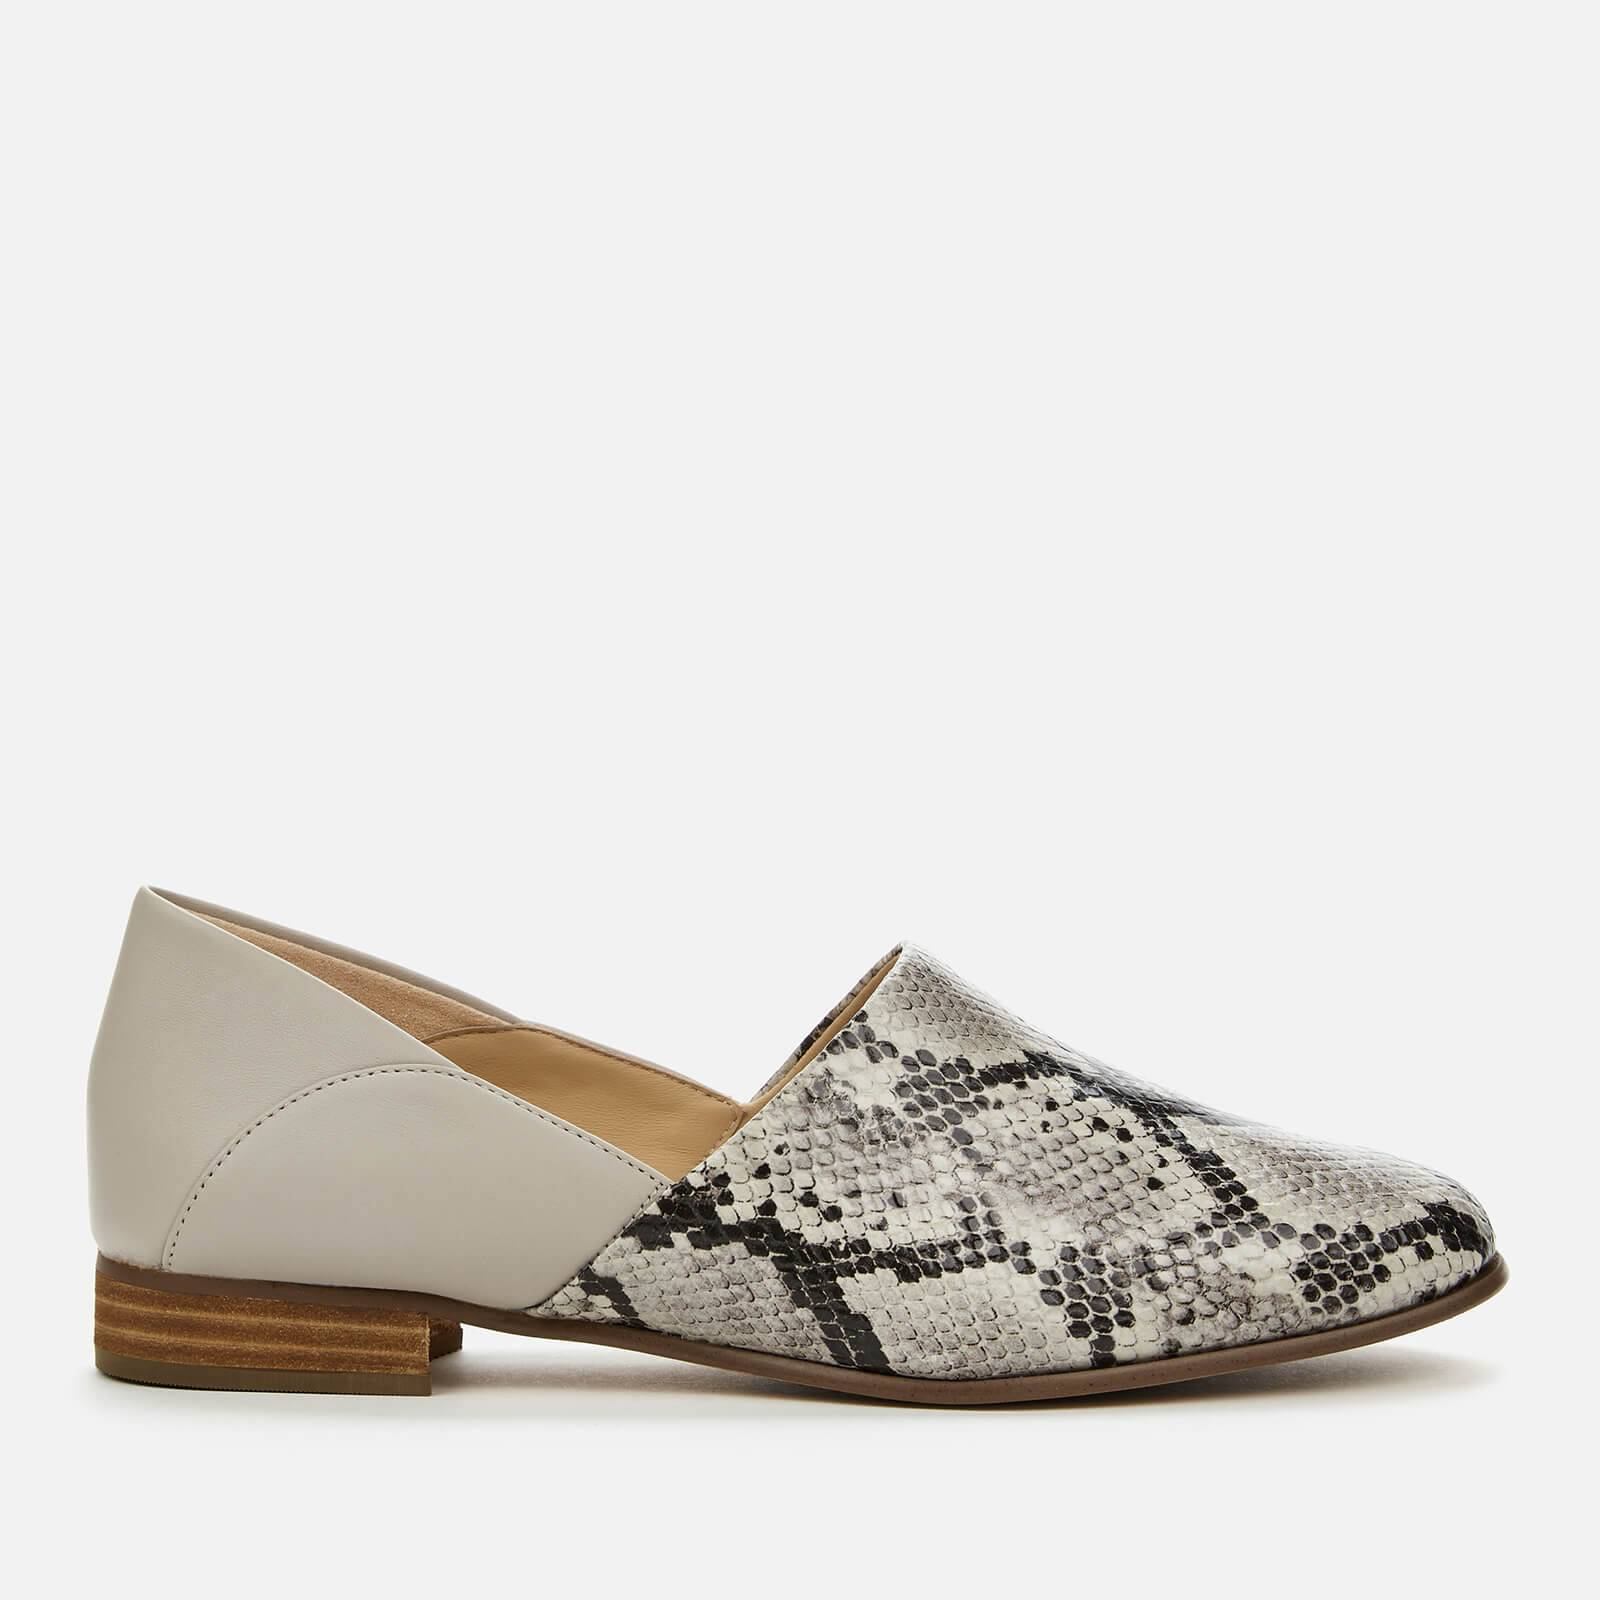 Clarks Women's Pure Tone Flat Shoes - Grey Snake - UK 6